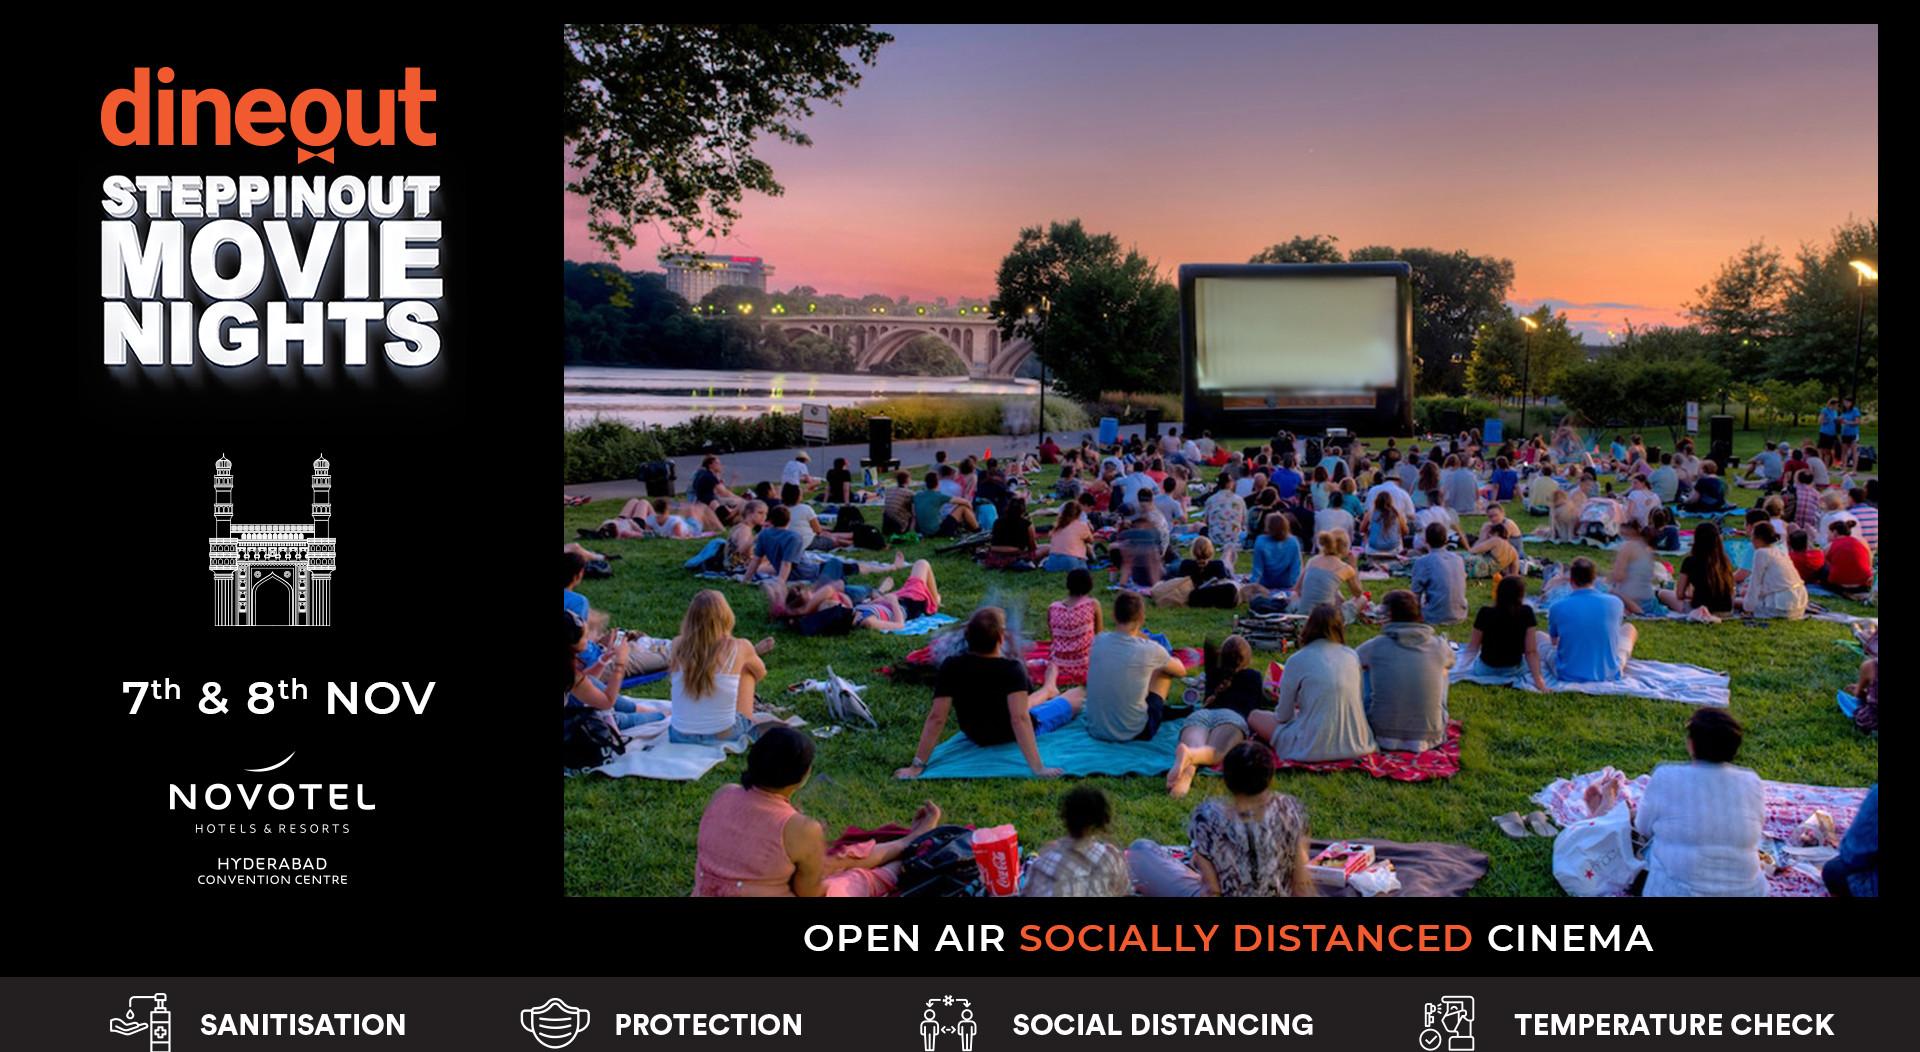 Dineout SteppinOut Movie Nights | Open Air Cinema | Superhero